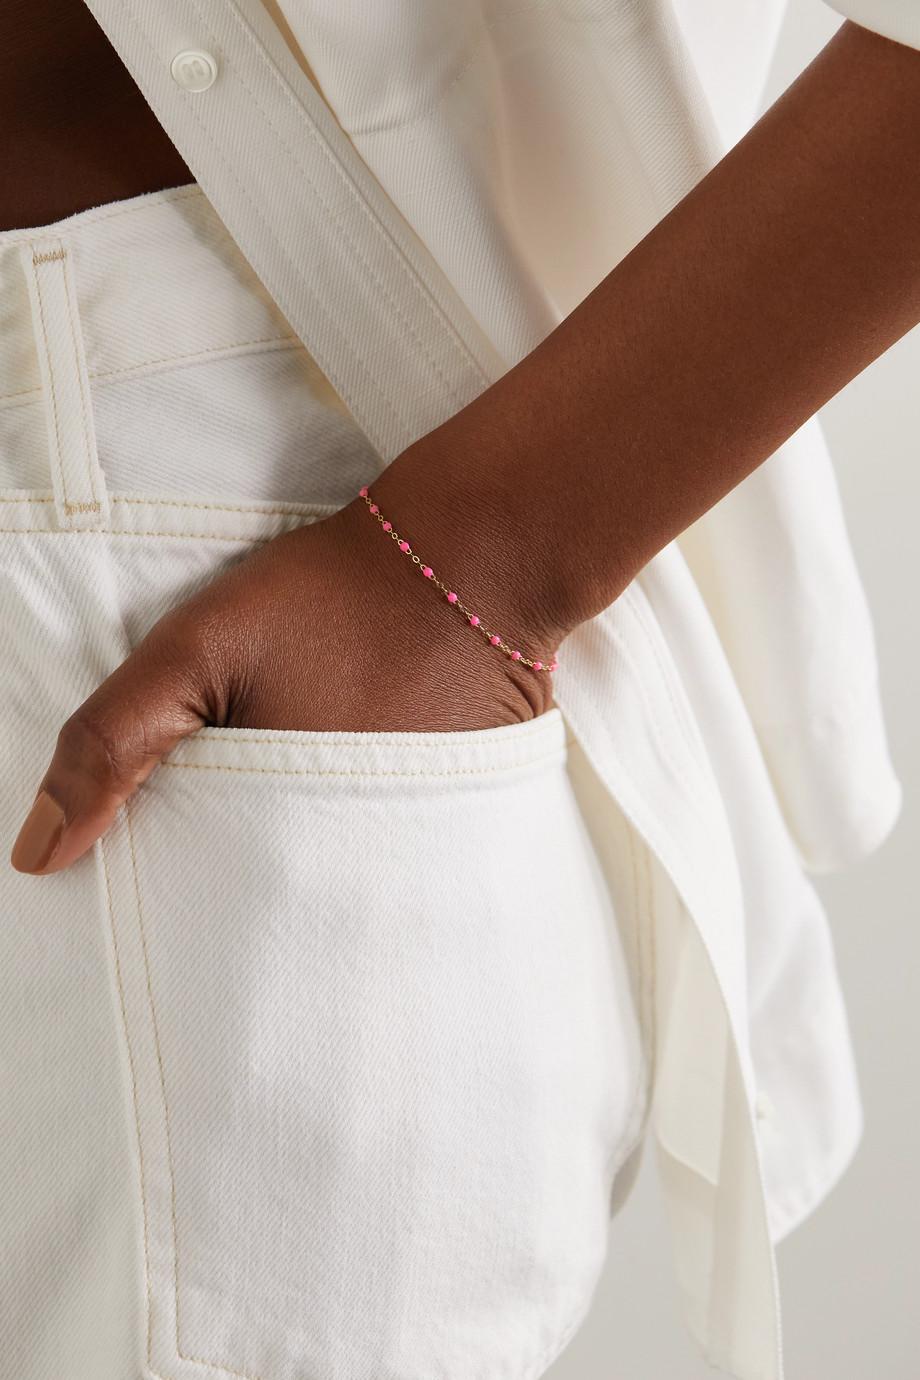 gigi CLOZEAU Classic Gigi Armband aus 18 Karat Gold mit Details aus Harz